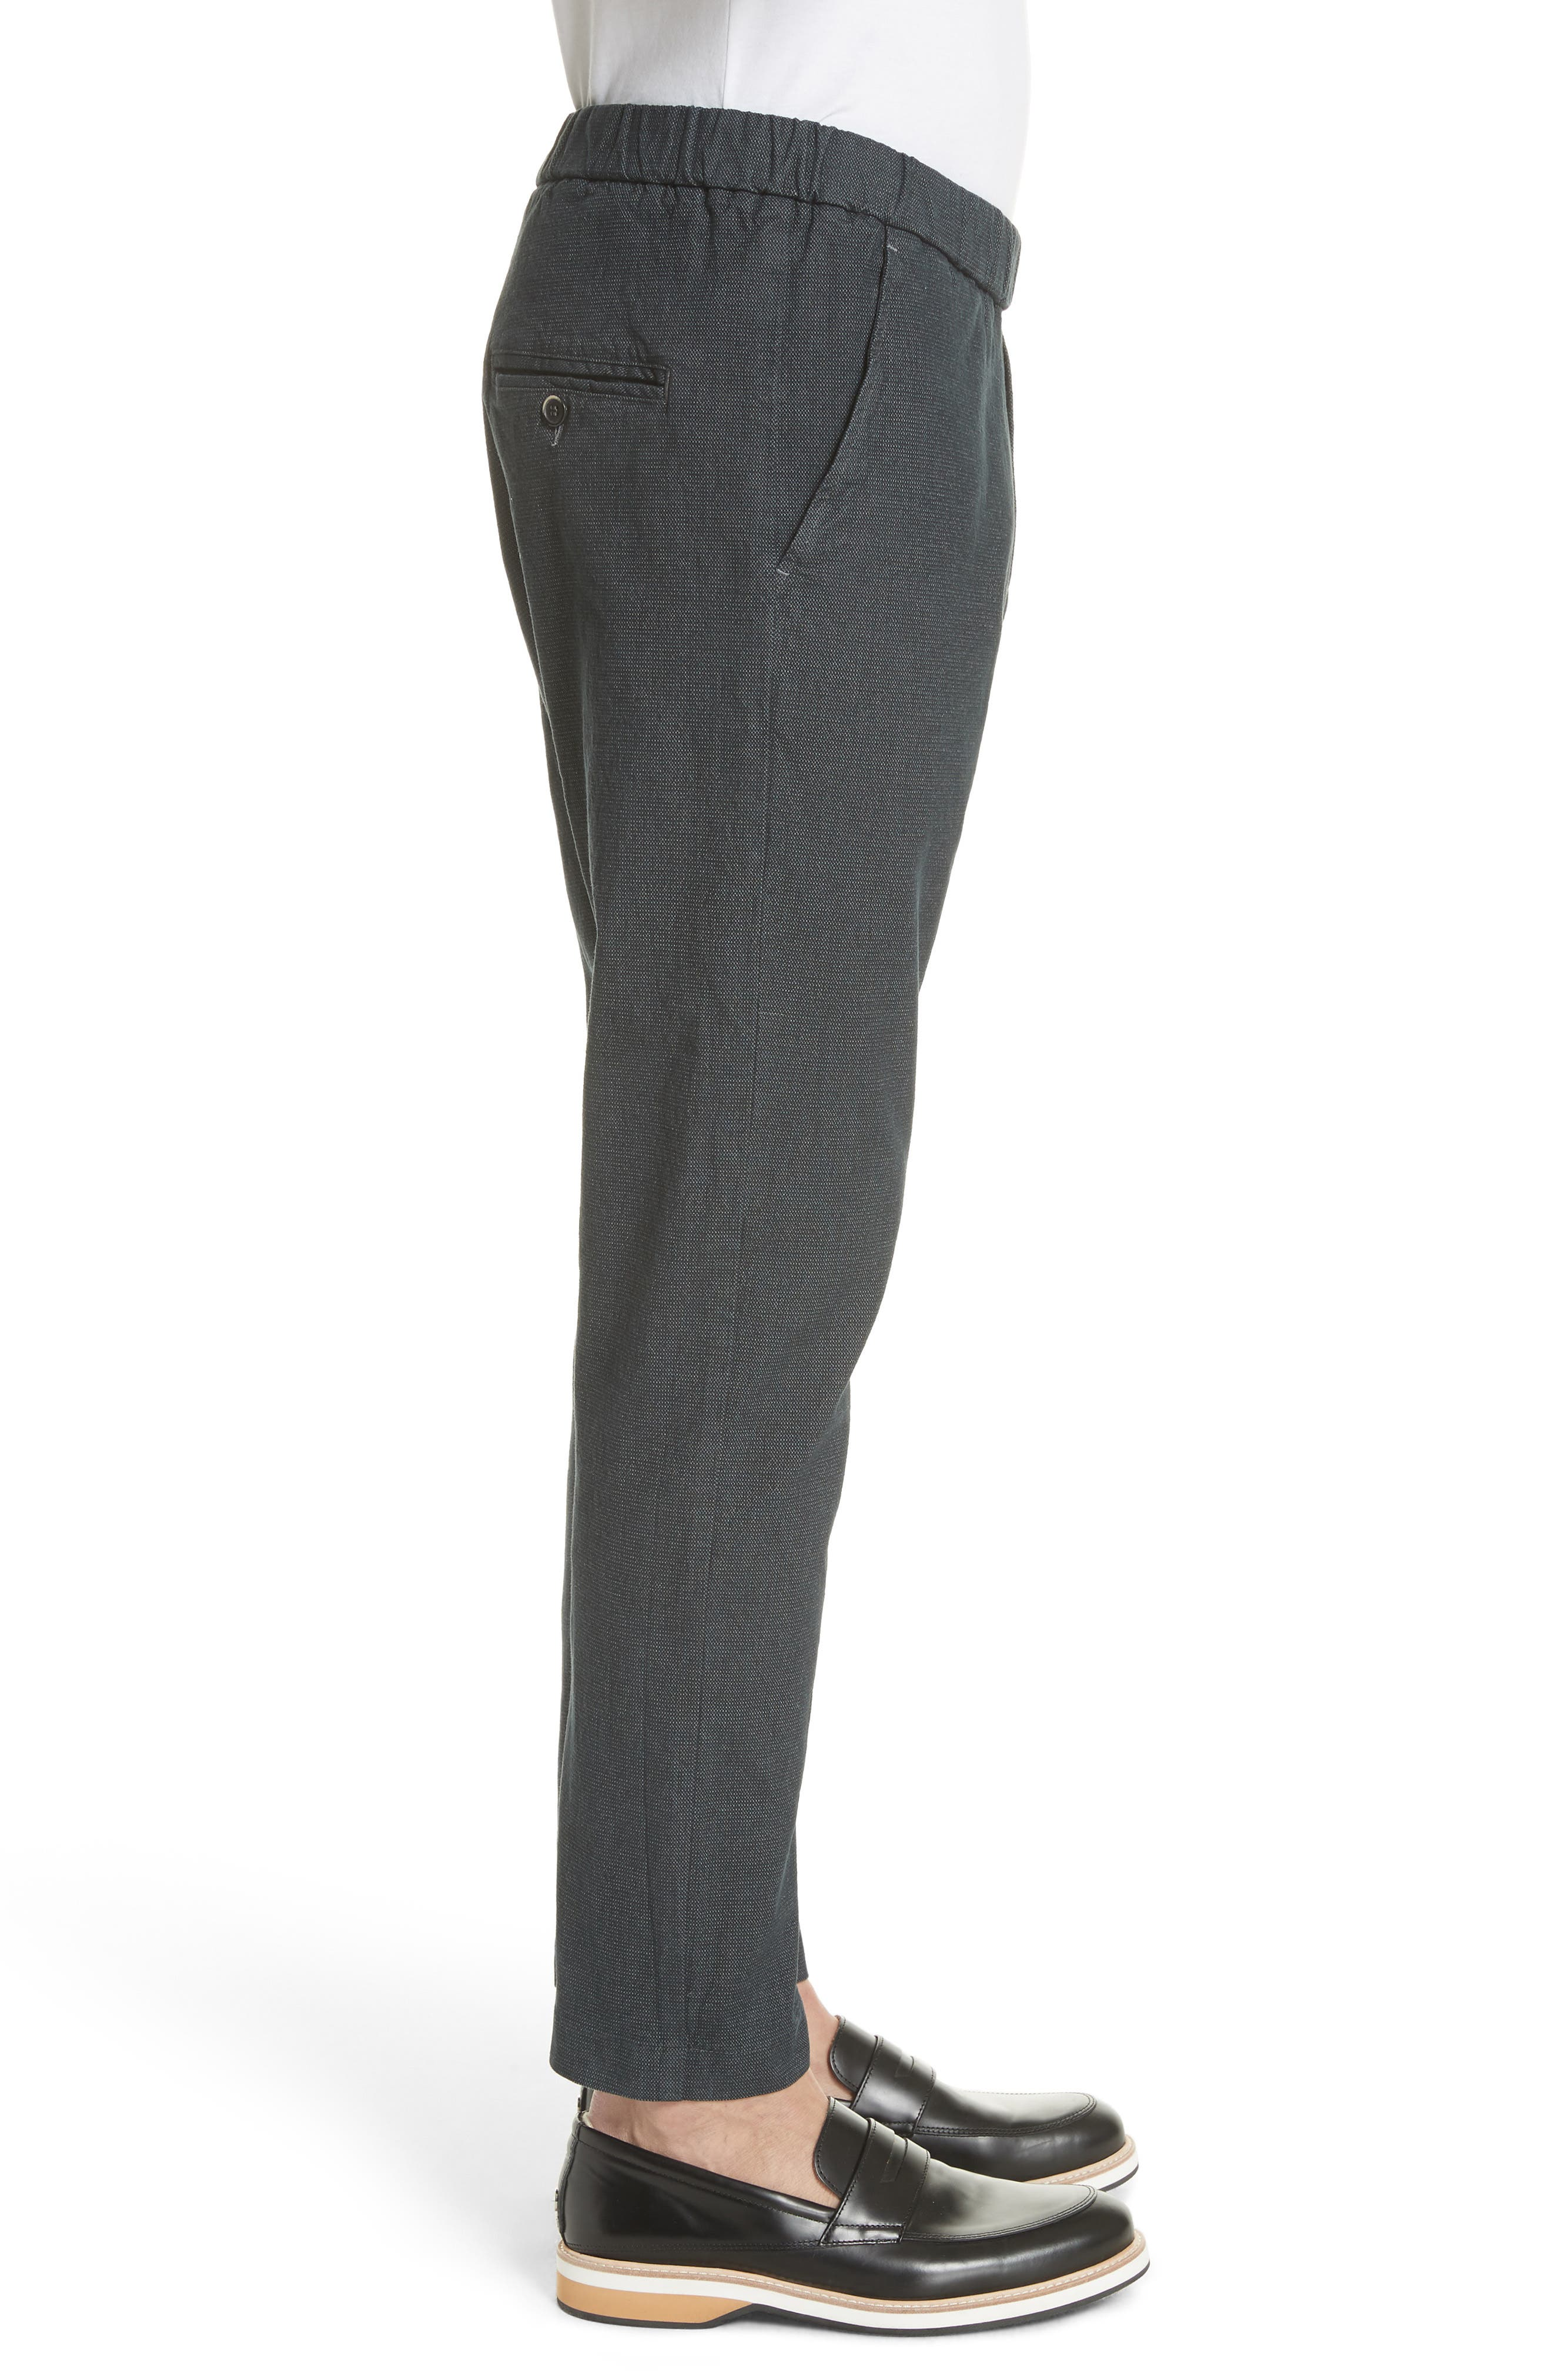 Aregna Ponto Trousers,                             Alternate thumbnail 3, color,                             020